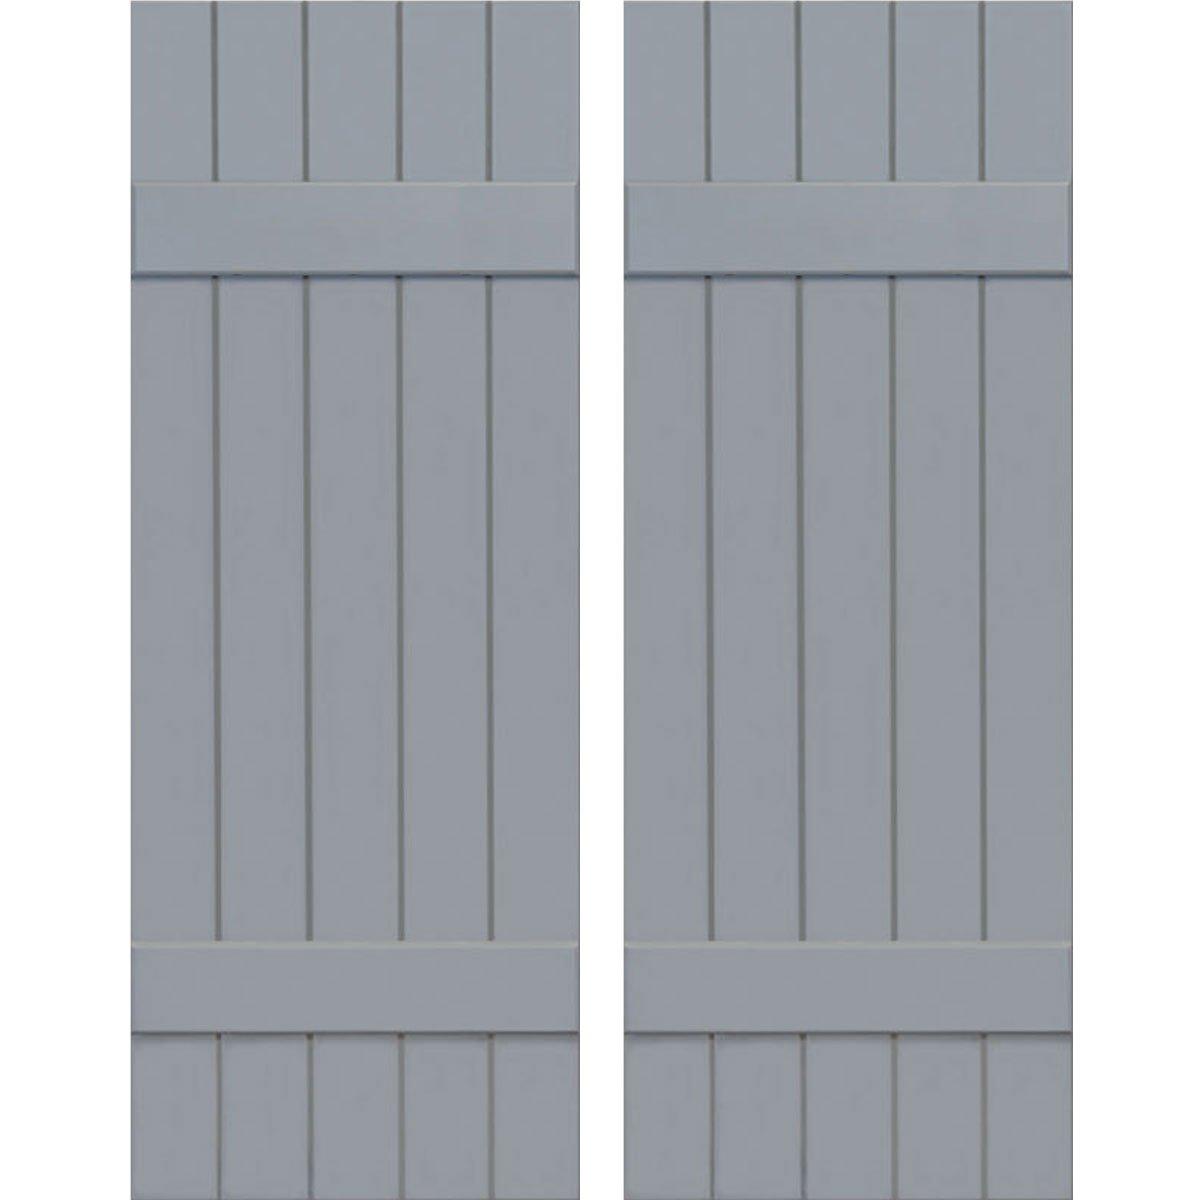 Ekena Millwork CWB18X062UNC Exterior Five Board